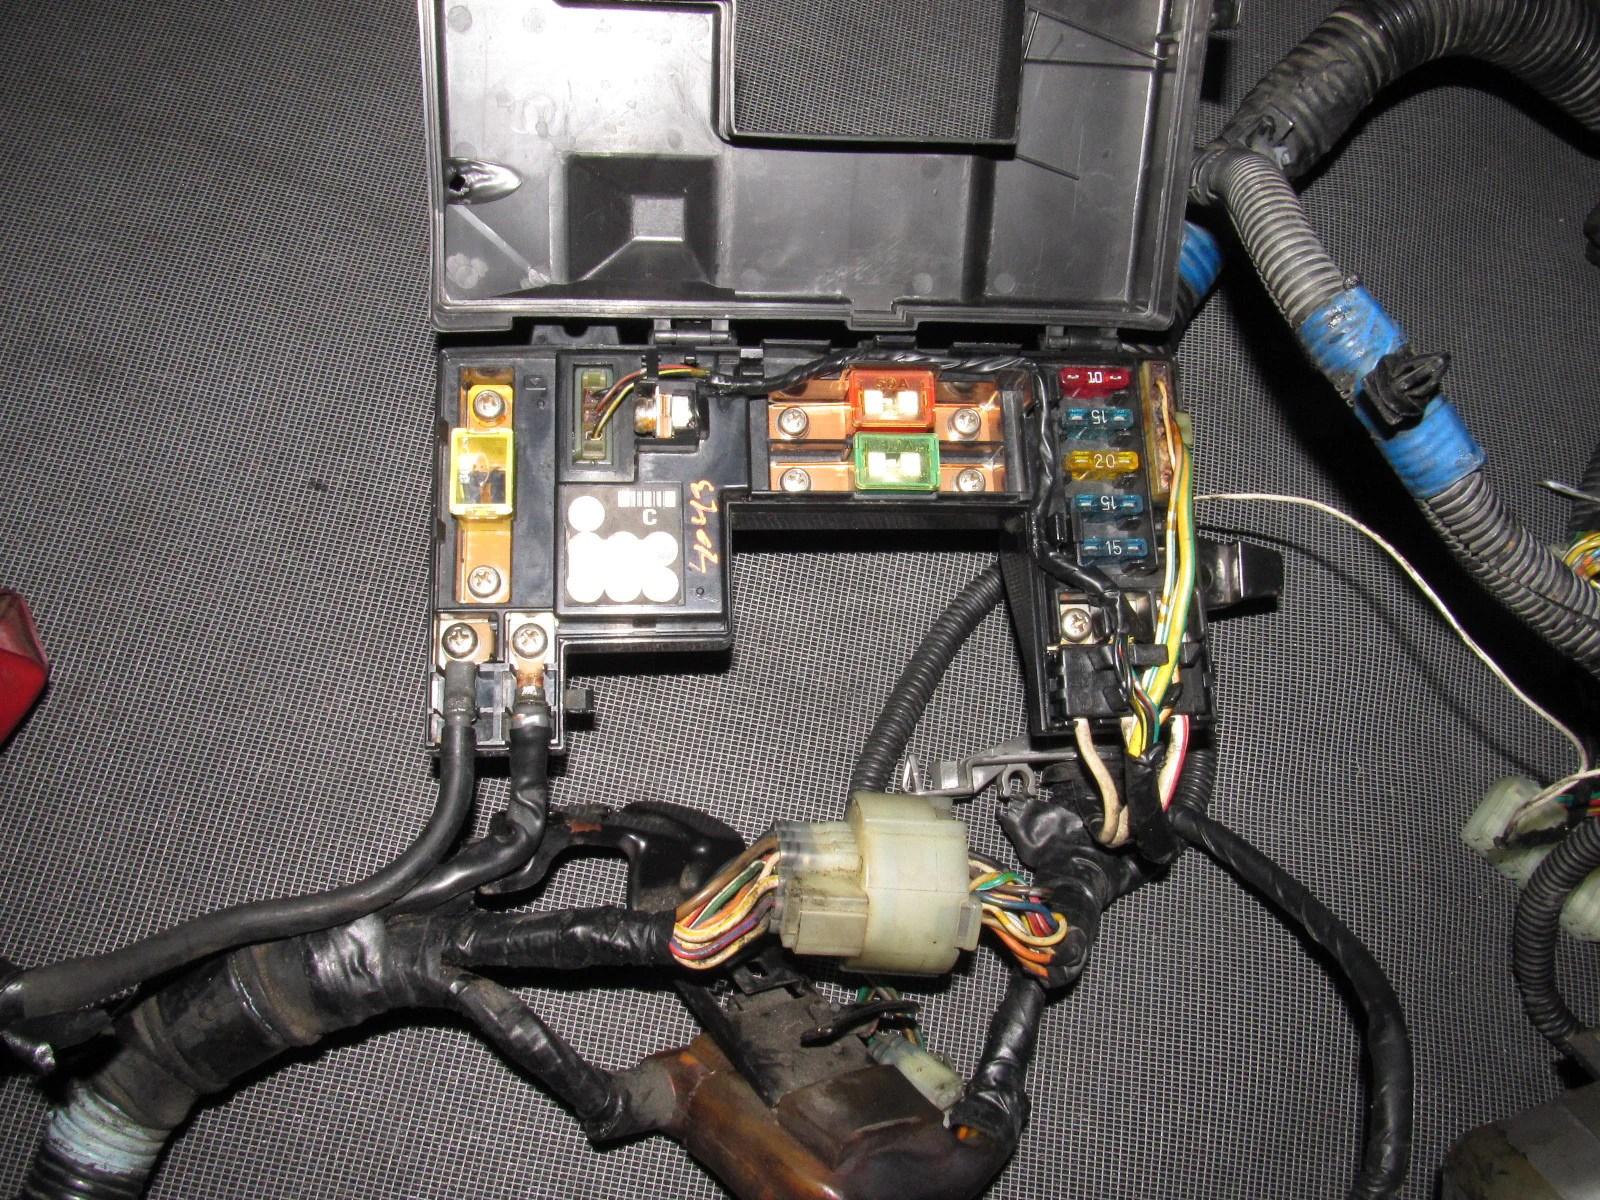 hight resolution of honda crx wiring harness wiring diagram expert honda crx wiring harness